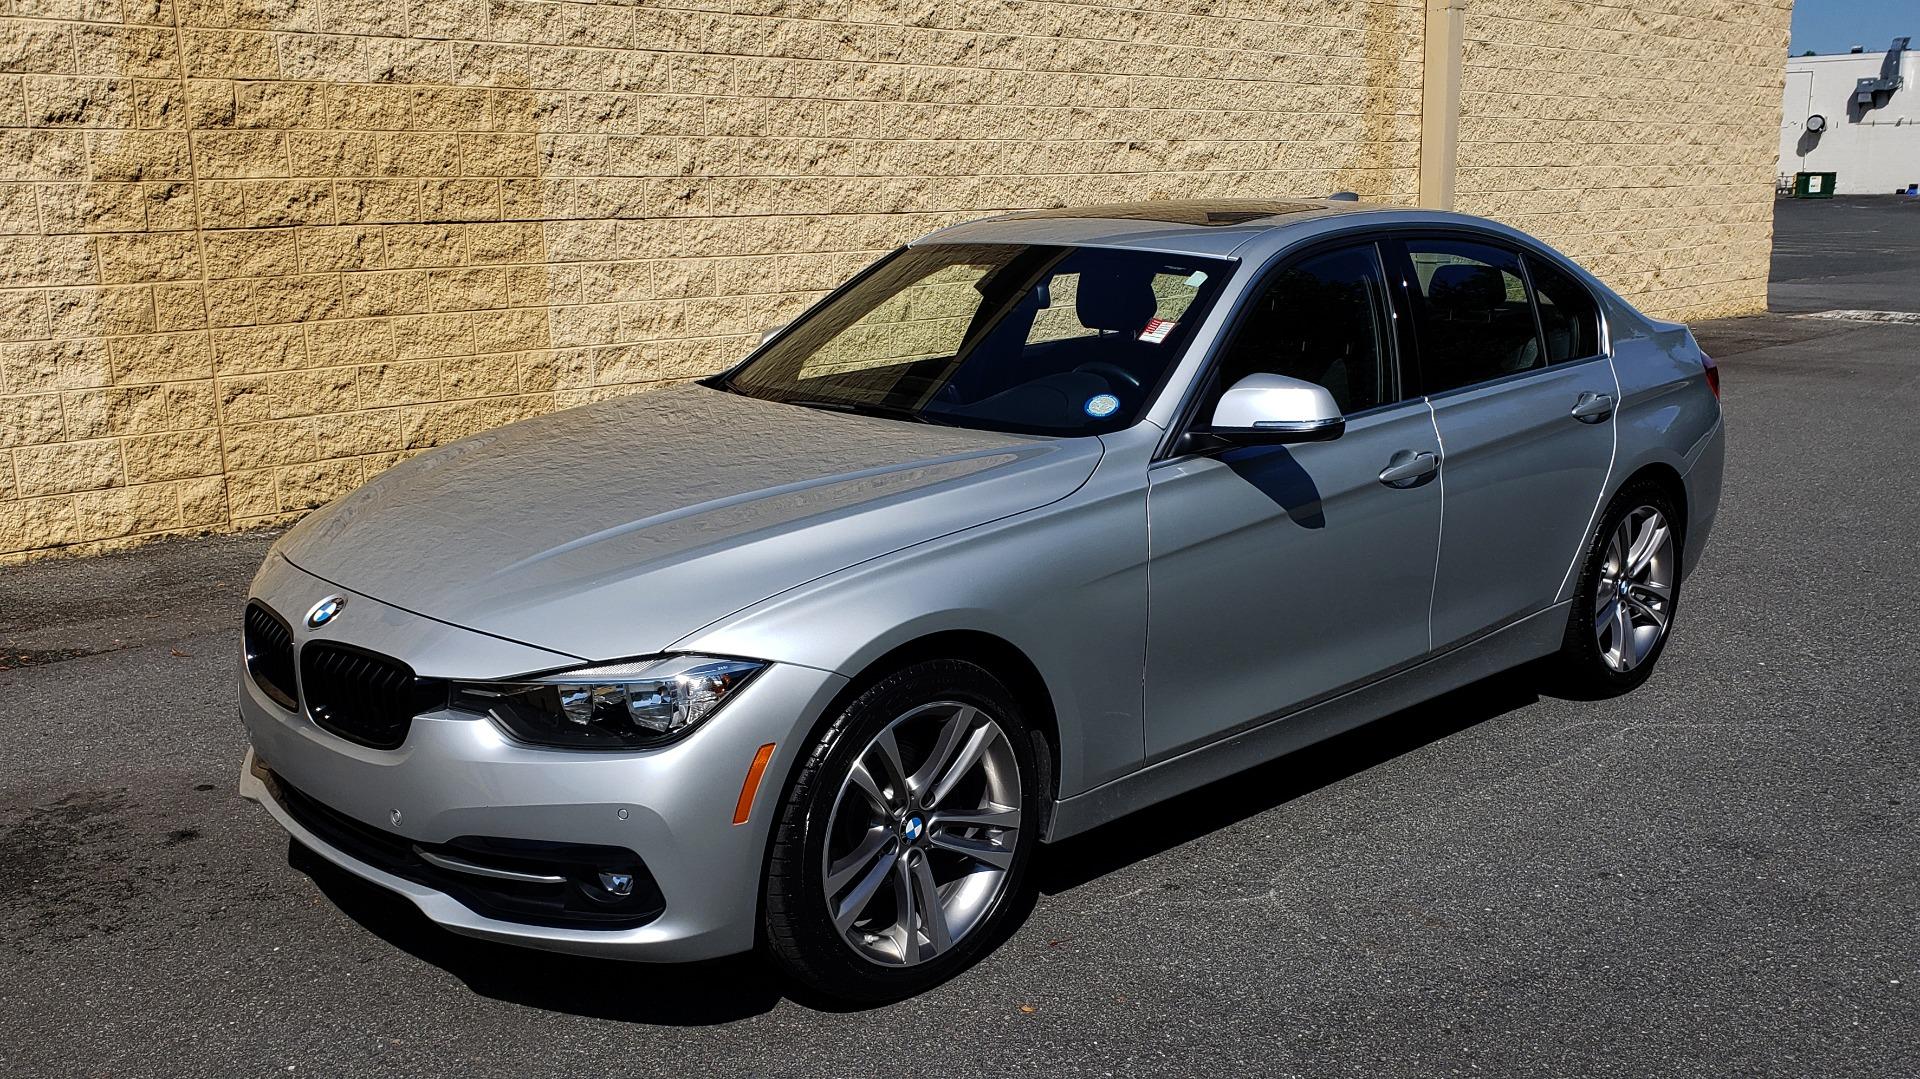 Used 2017 BMW 3 SERIES 330I SPORT SEDAN / DRVR ASST PKG / SUNROOF / REARVIEW for sale Sold at Formula Imports in Charlotte NC 28227 1